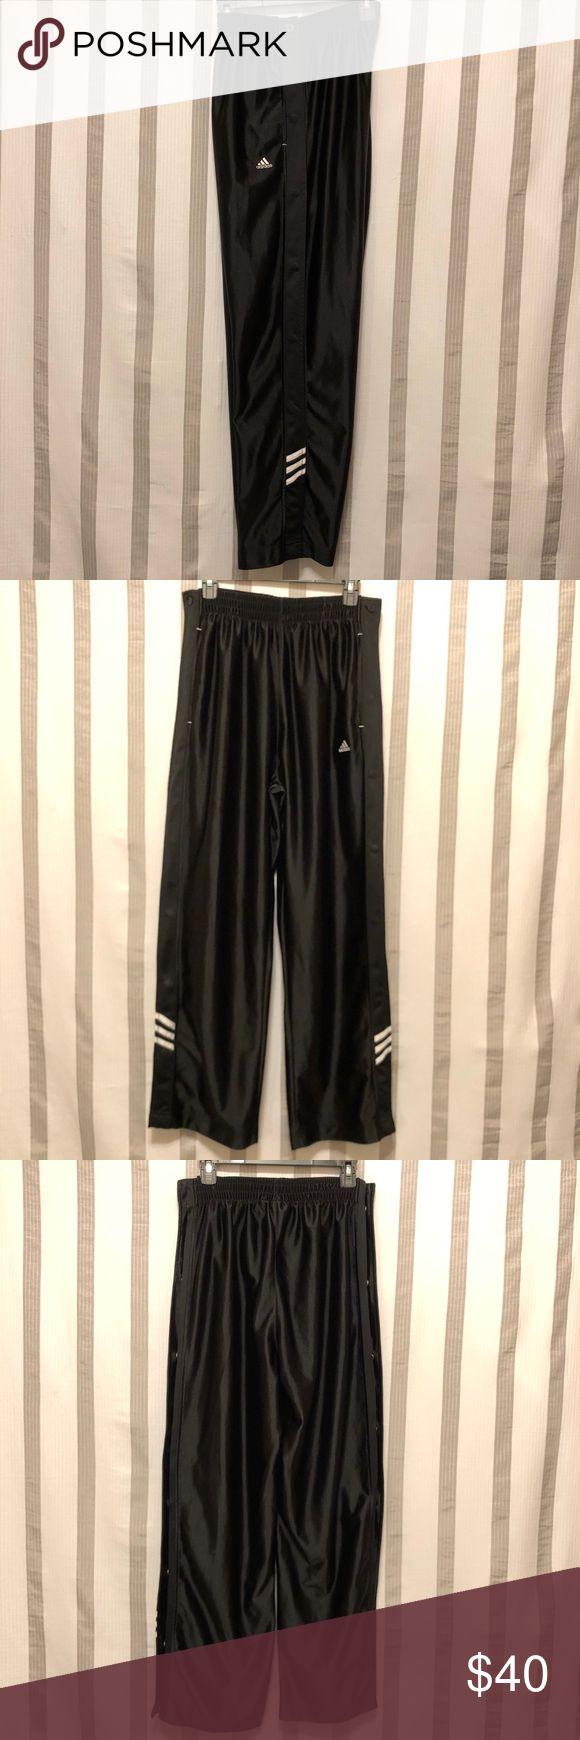 "New. Adidas Tear Away Basketball Pants NWOT. Beautiful Black & White Adidas Basketball Tear Away Pants. Size Medium. Flat measurements: 13"" to 17"" waist, 23"" Hips, 14"" Rise, 31"" inseam. adidas Pants"